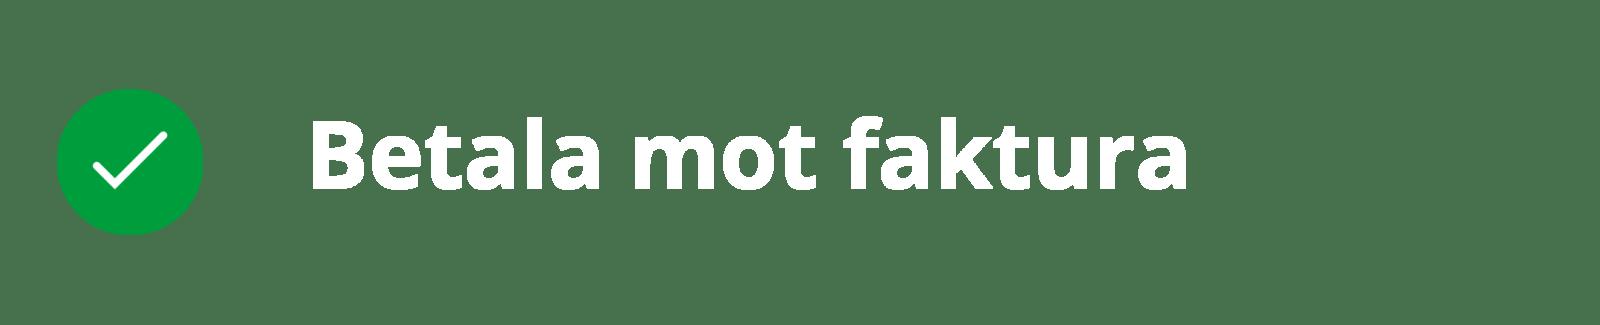 Slogan-5.png